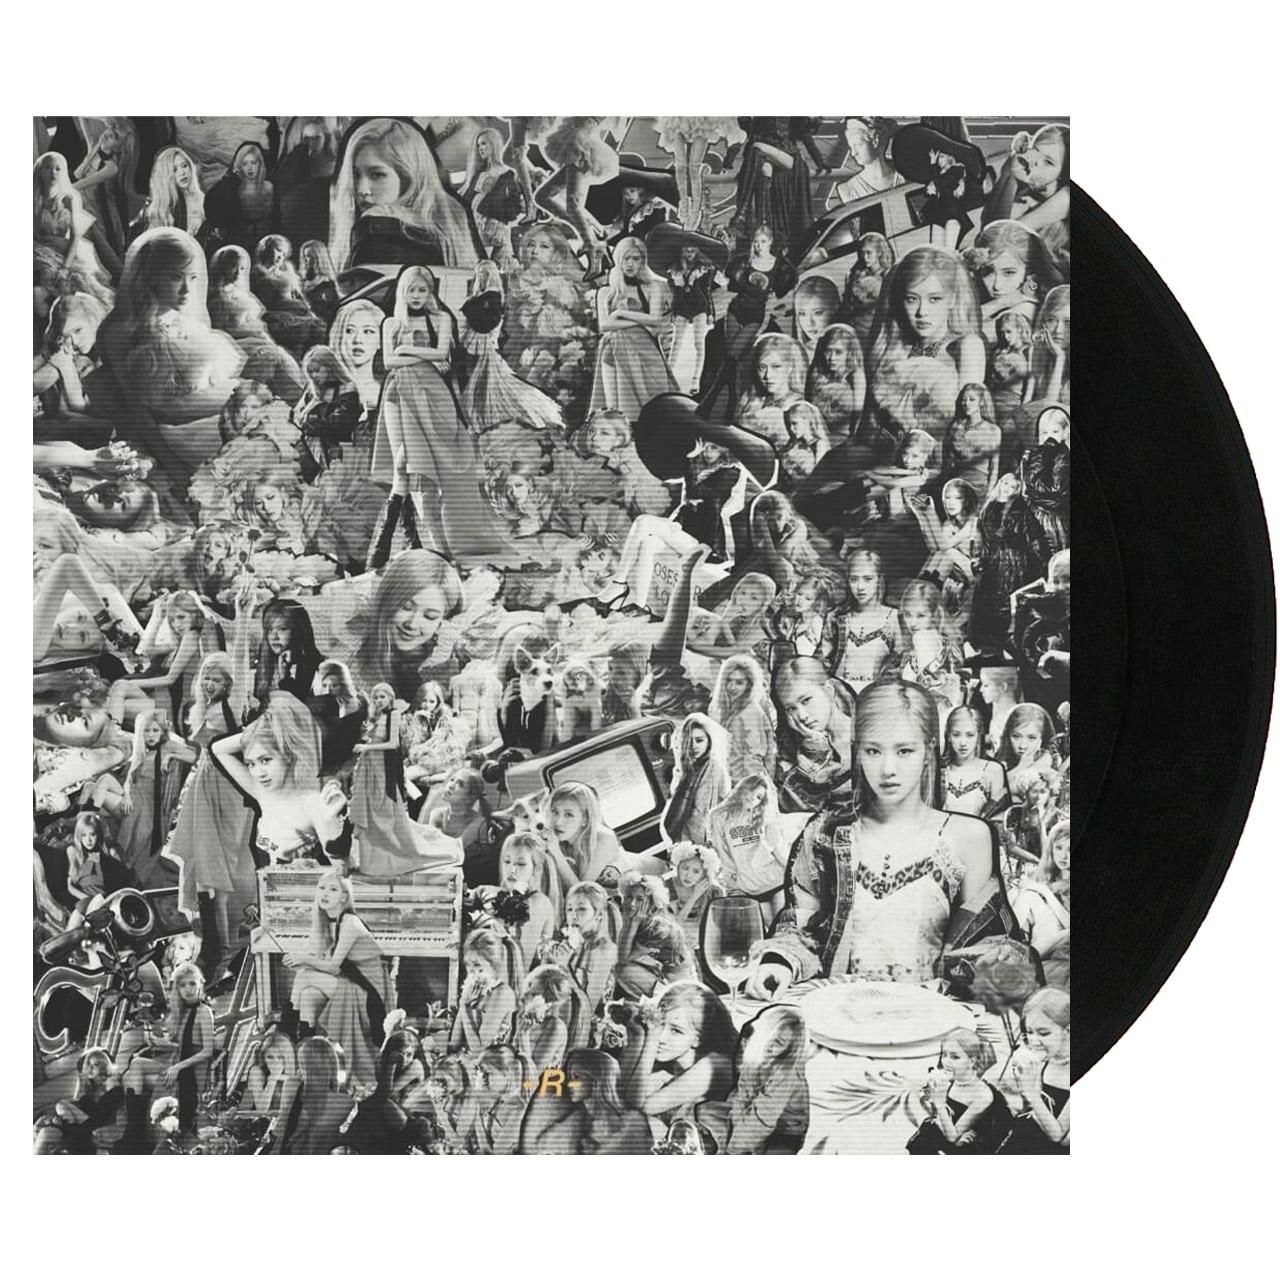 BLACKPINK Rosé -R- Vinyl